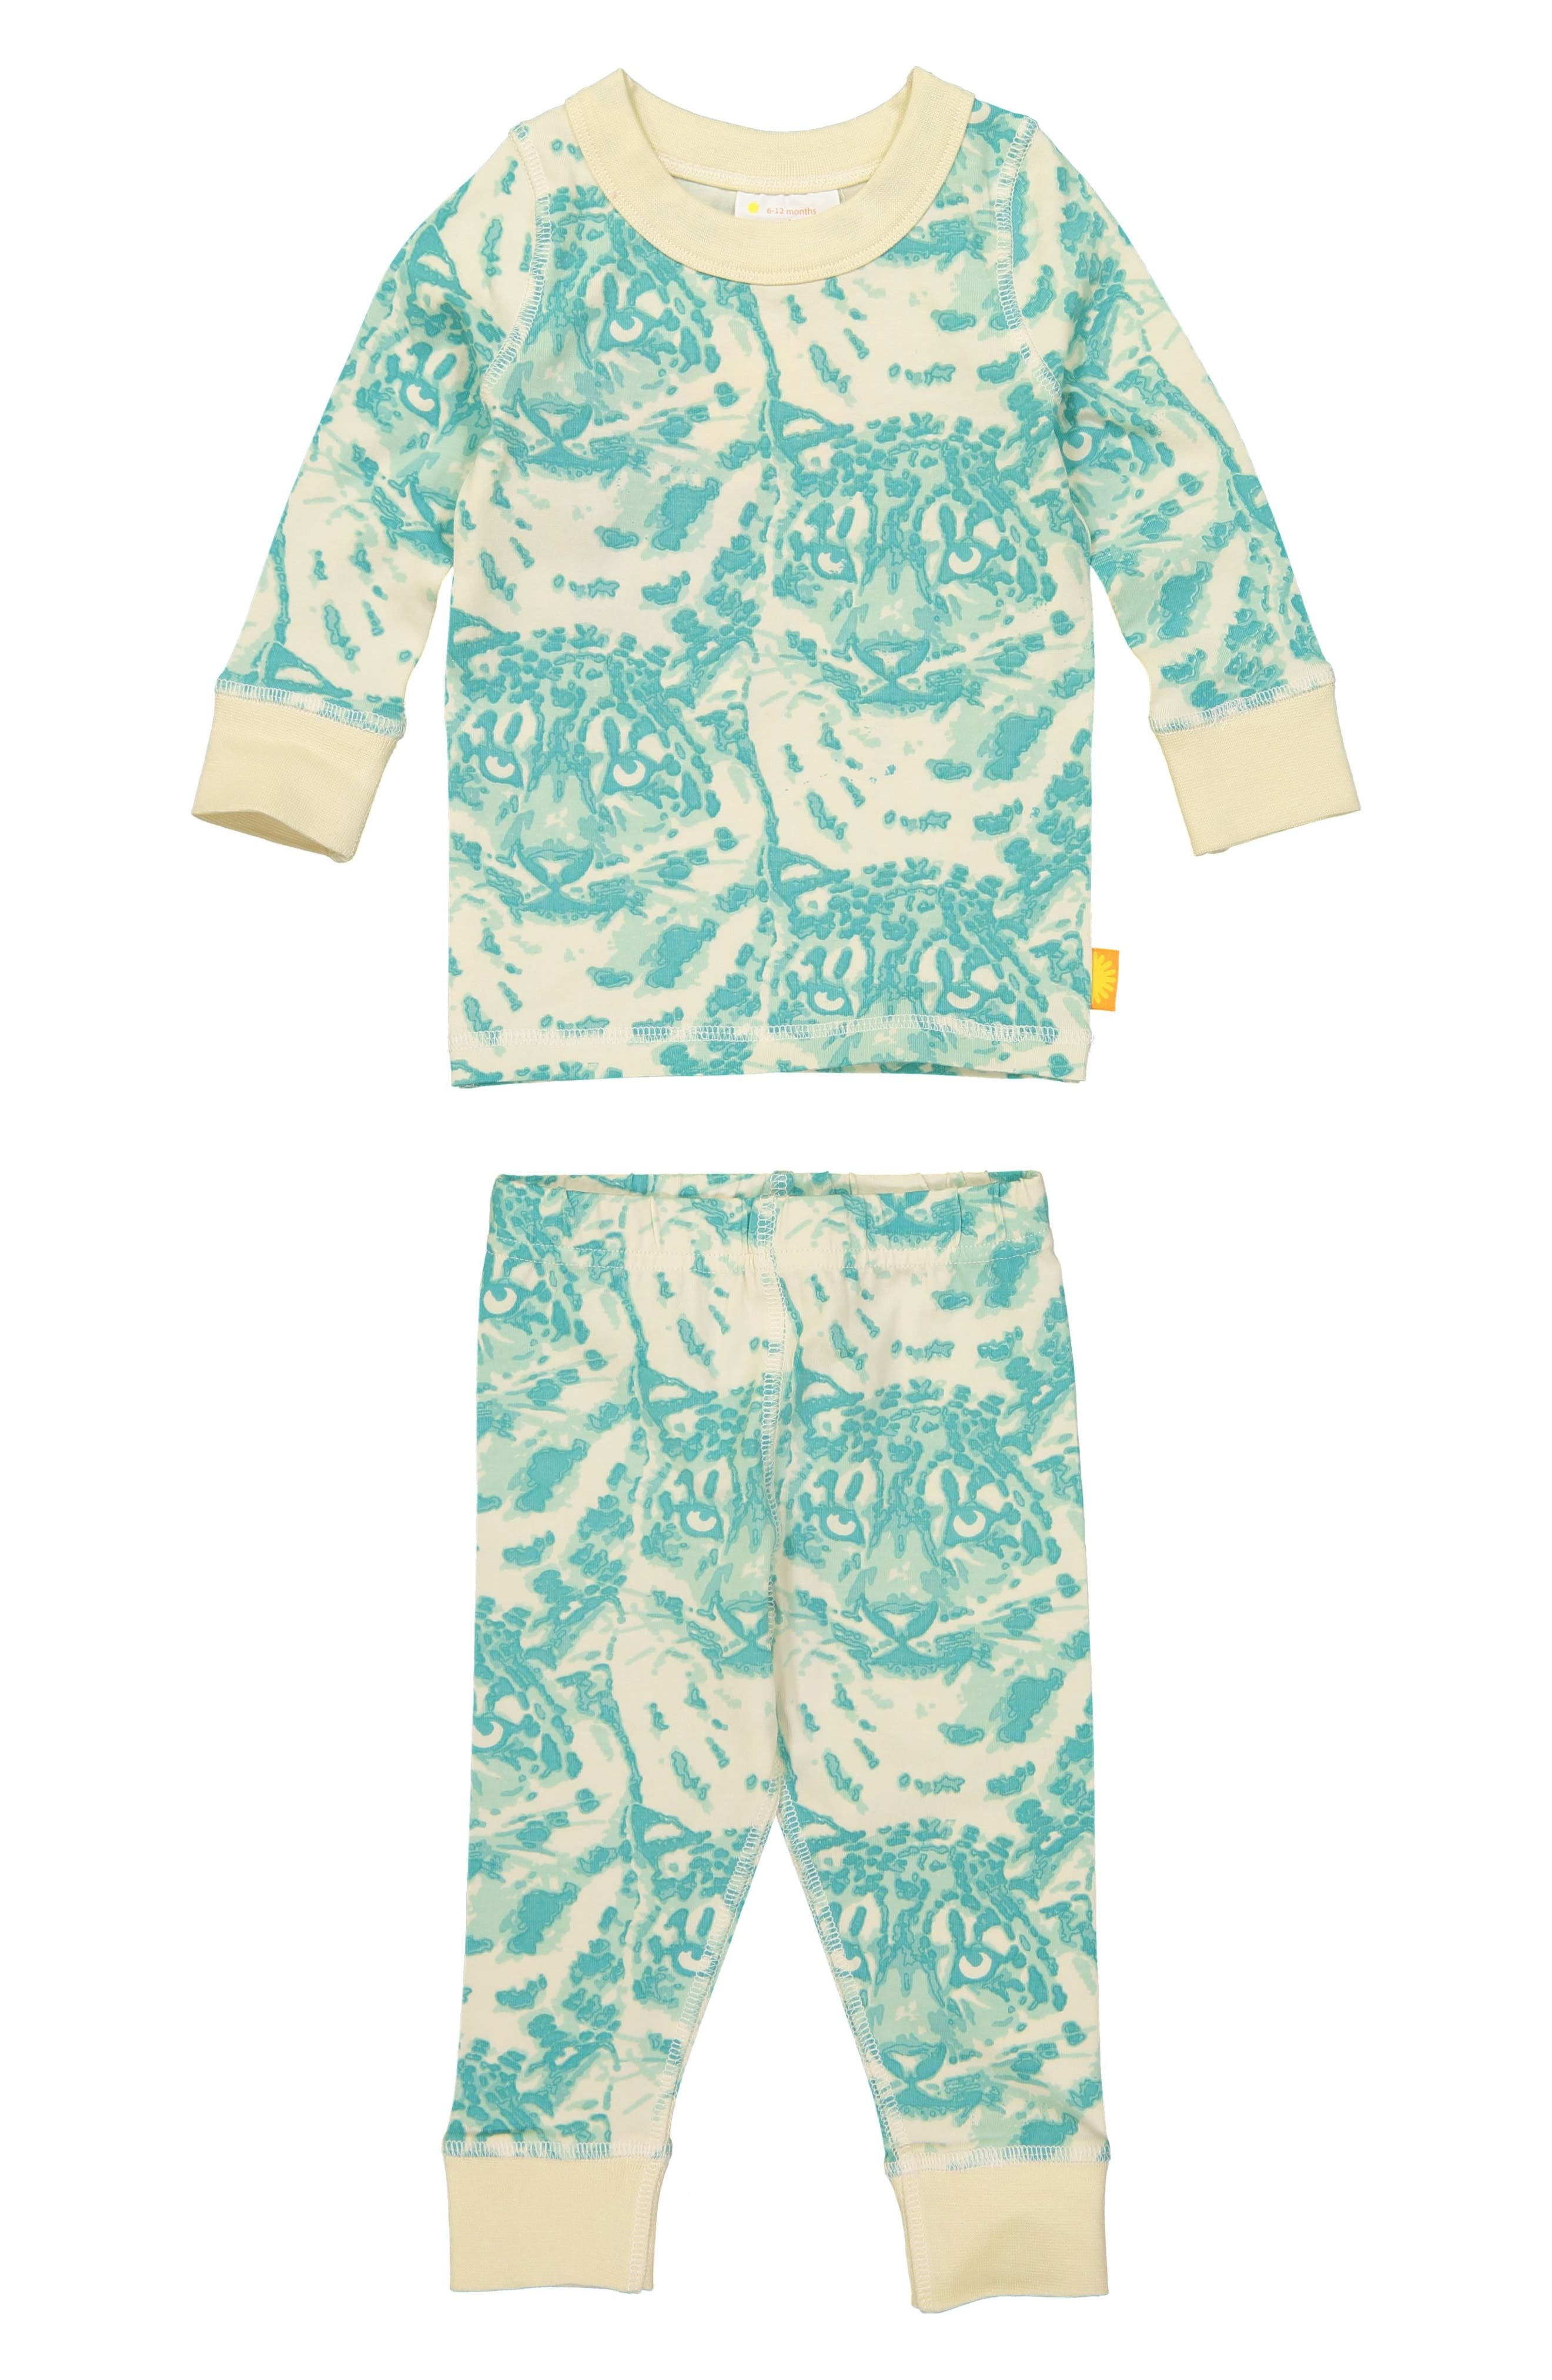 Cat Camo Organic Cotton Fitted Two-Piece Pajamas,                         Main,                         color, AQUA